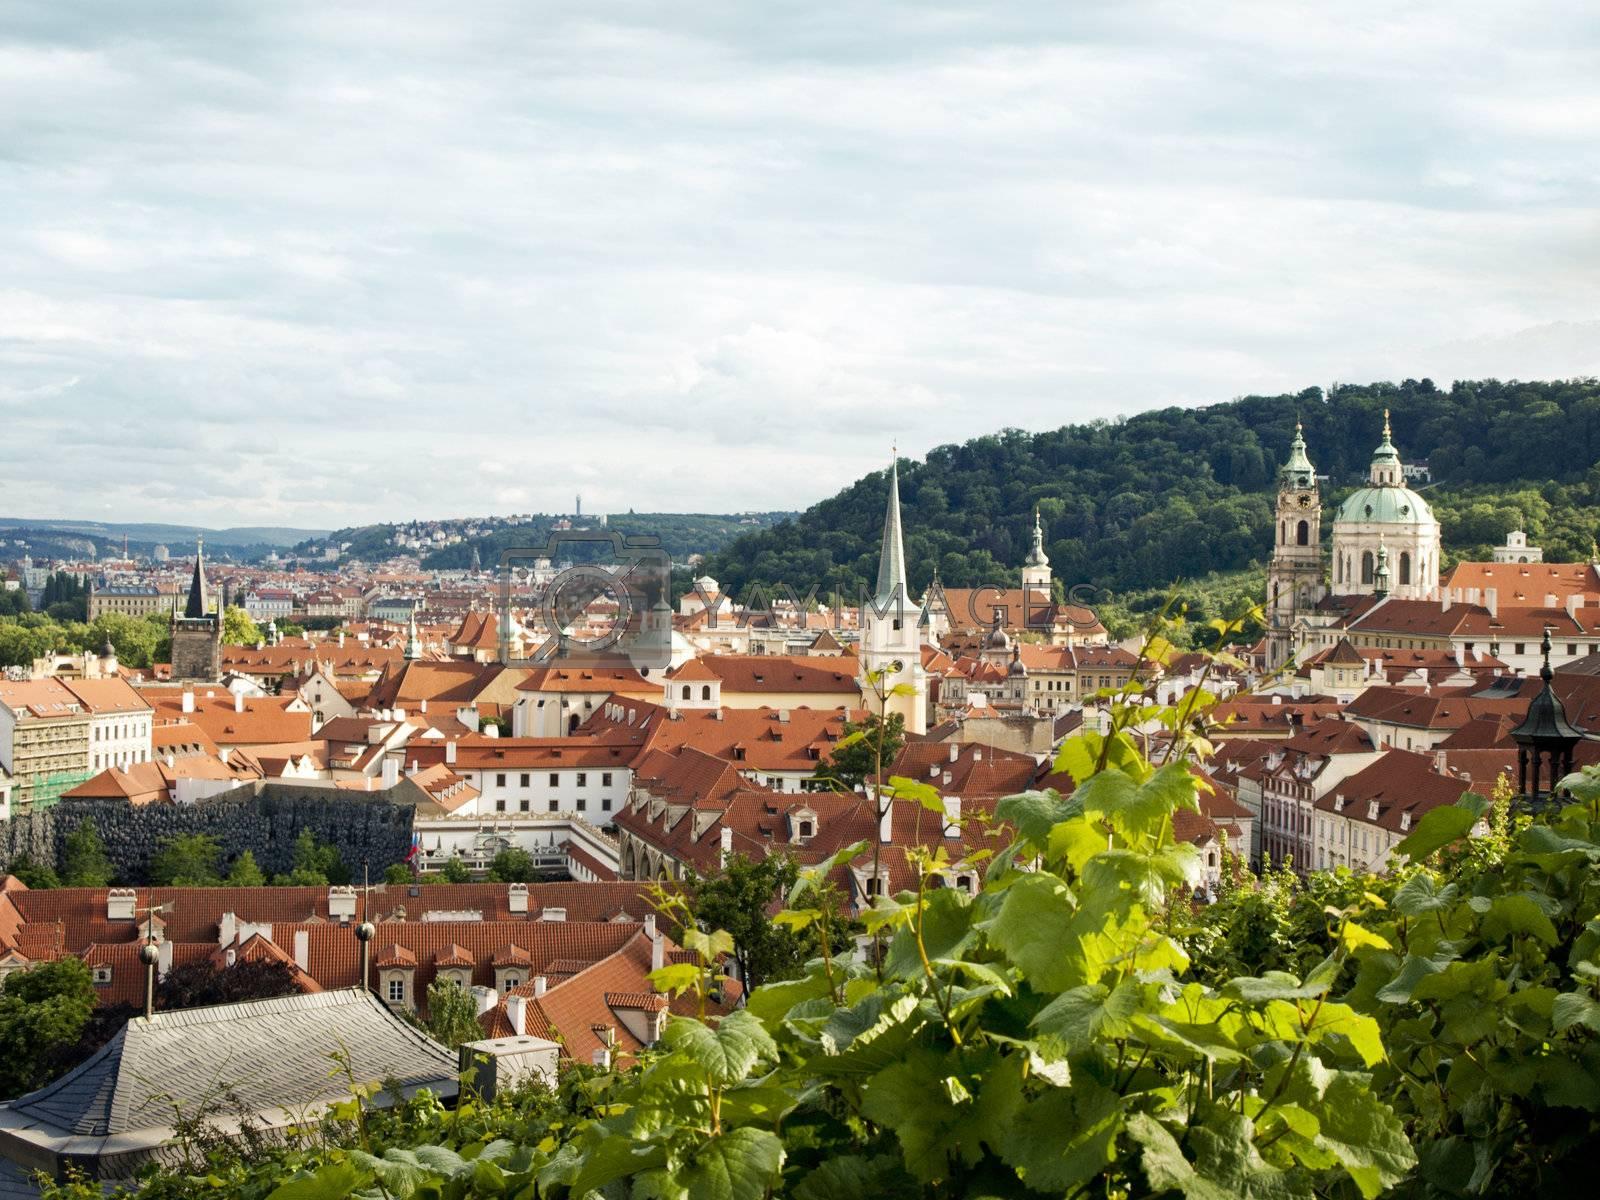 Panoramic view of the Prague, summer 2012